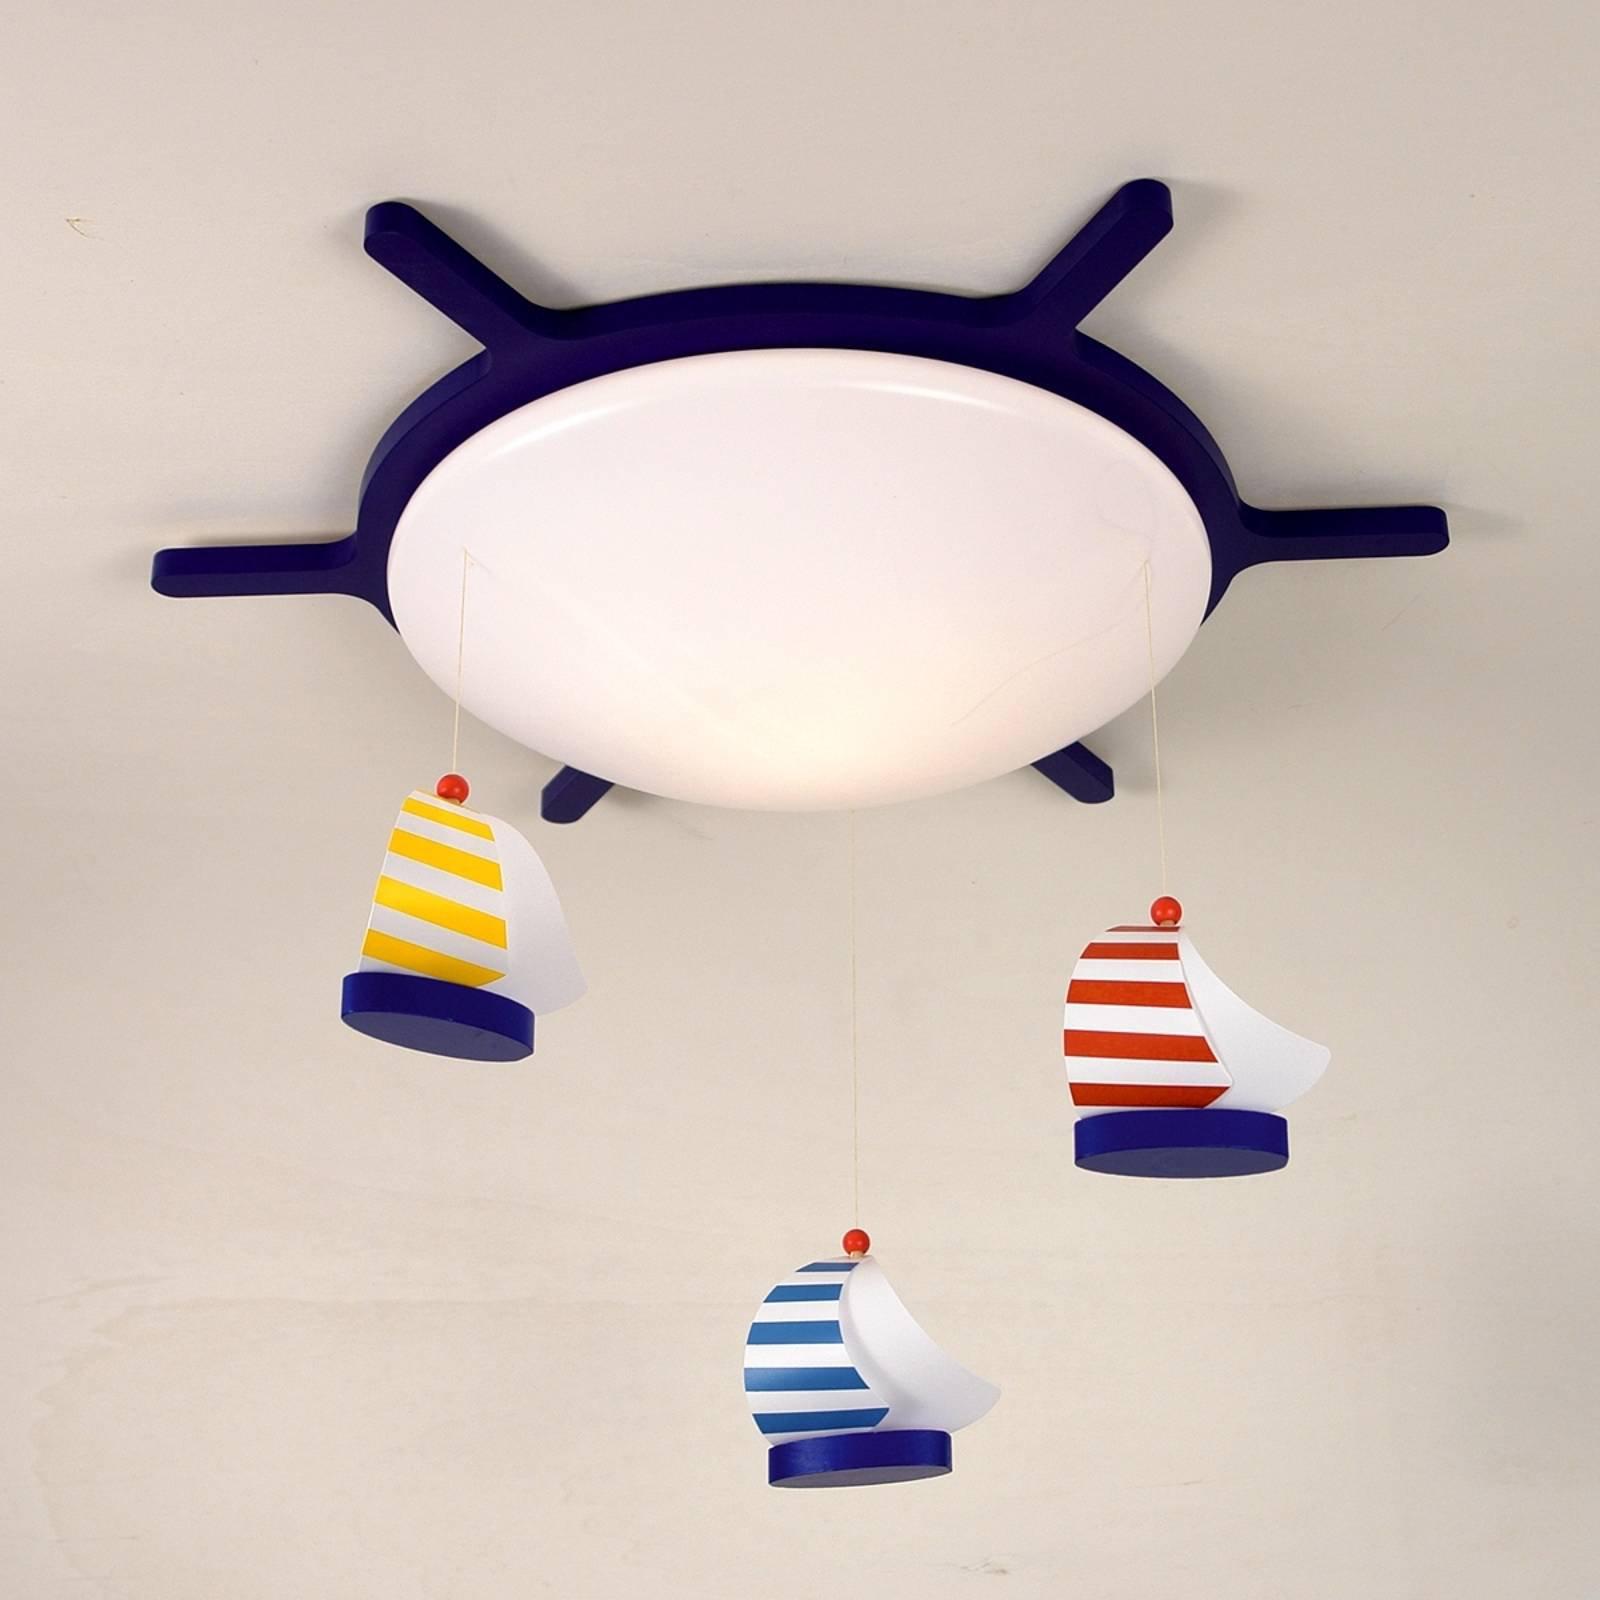 SEILBÅT taklampe med båtmotiv